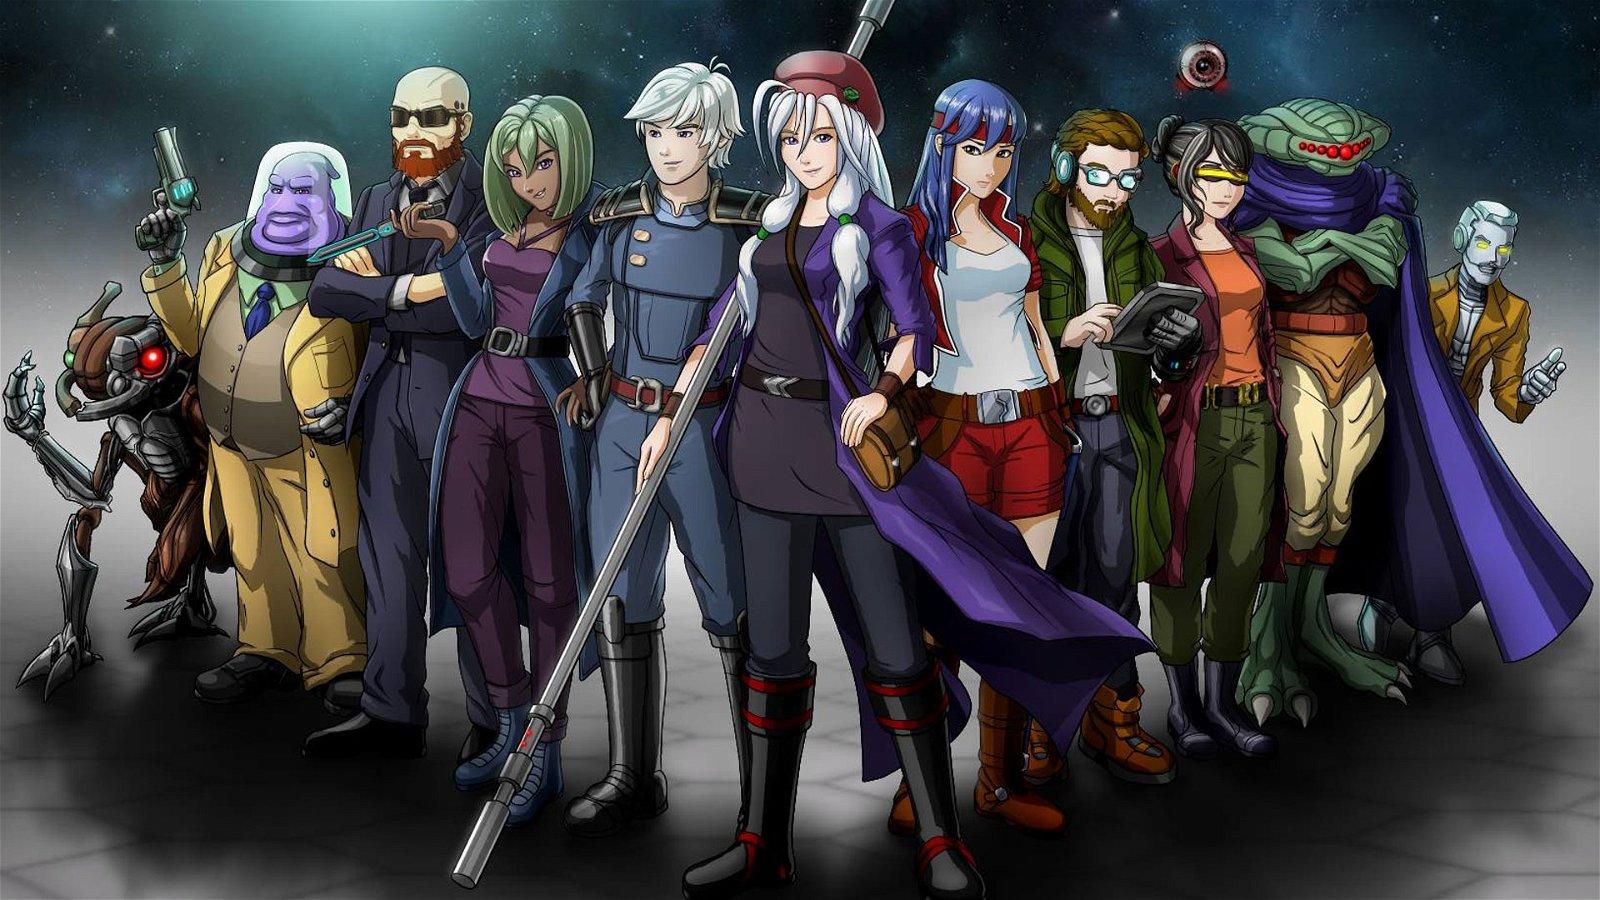 Cosmic Star Heroine Review - Fun for Retro RPG Fans 5